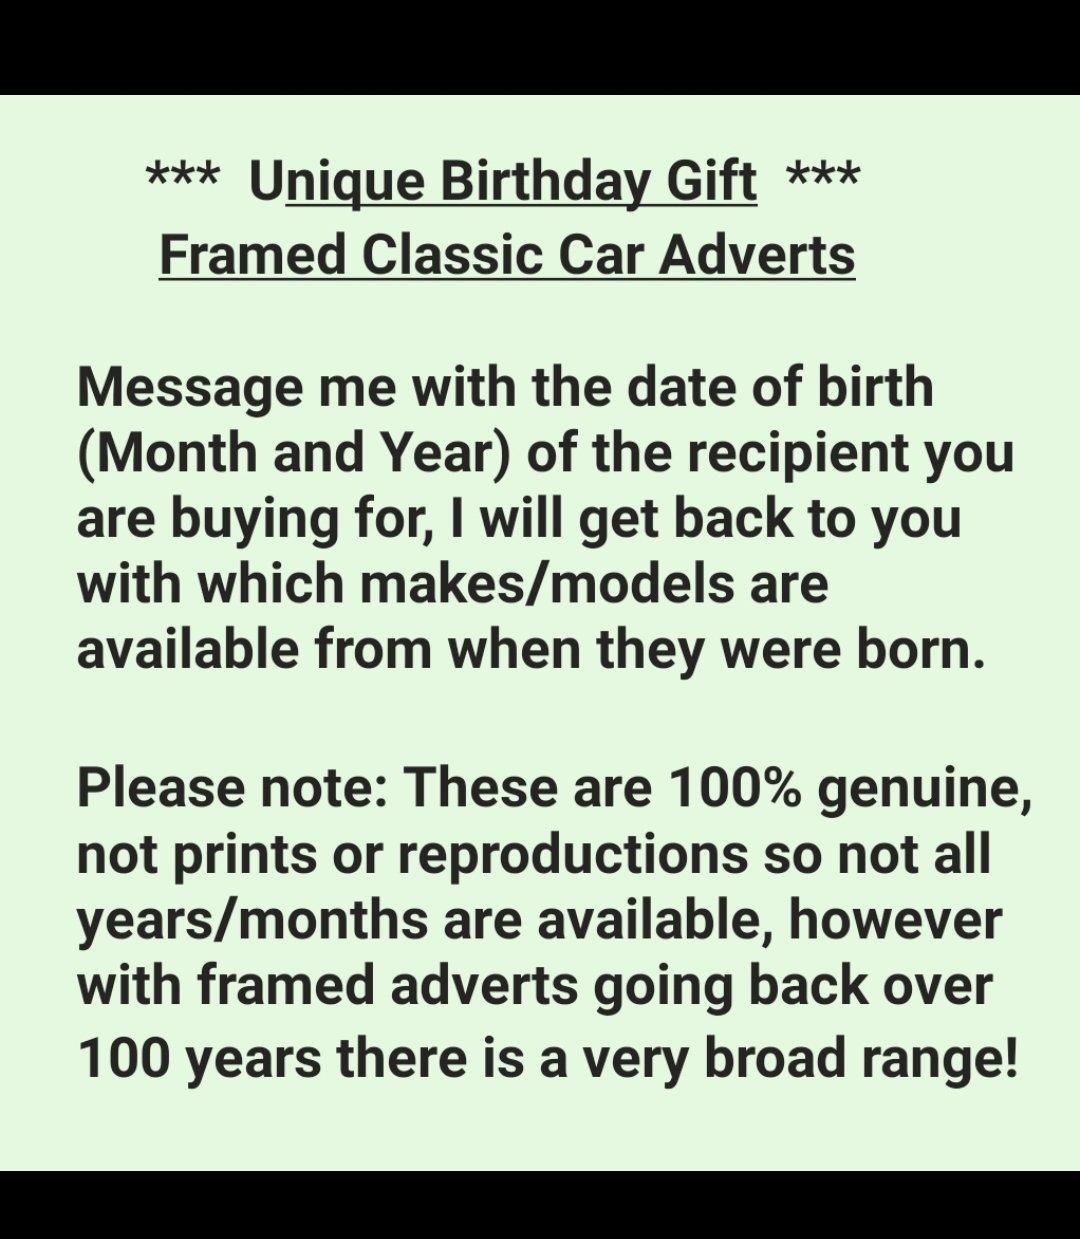 1968 Original 1978 Honda Civic Framed Advert For Sale (picture 3 of 3)